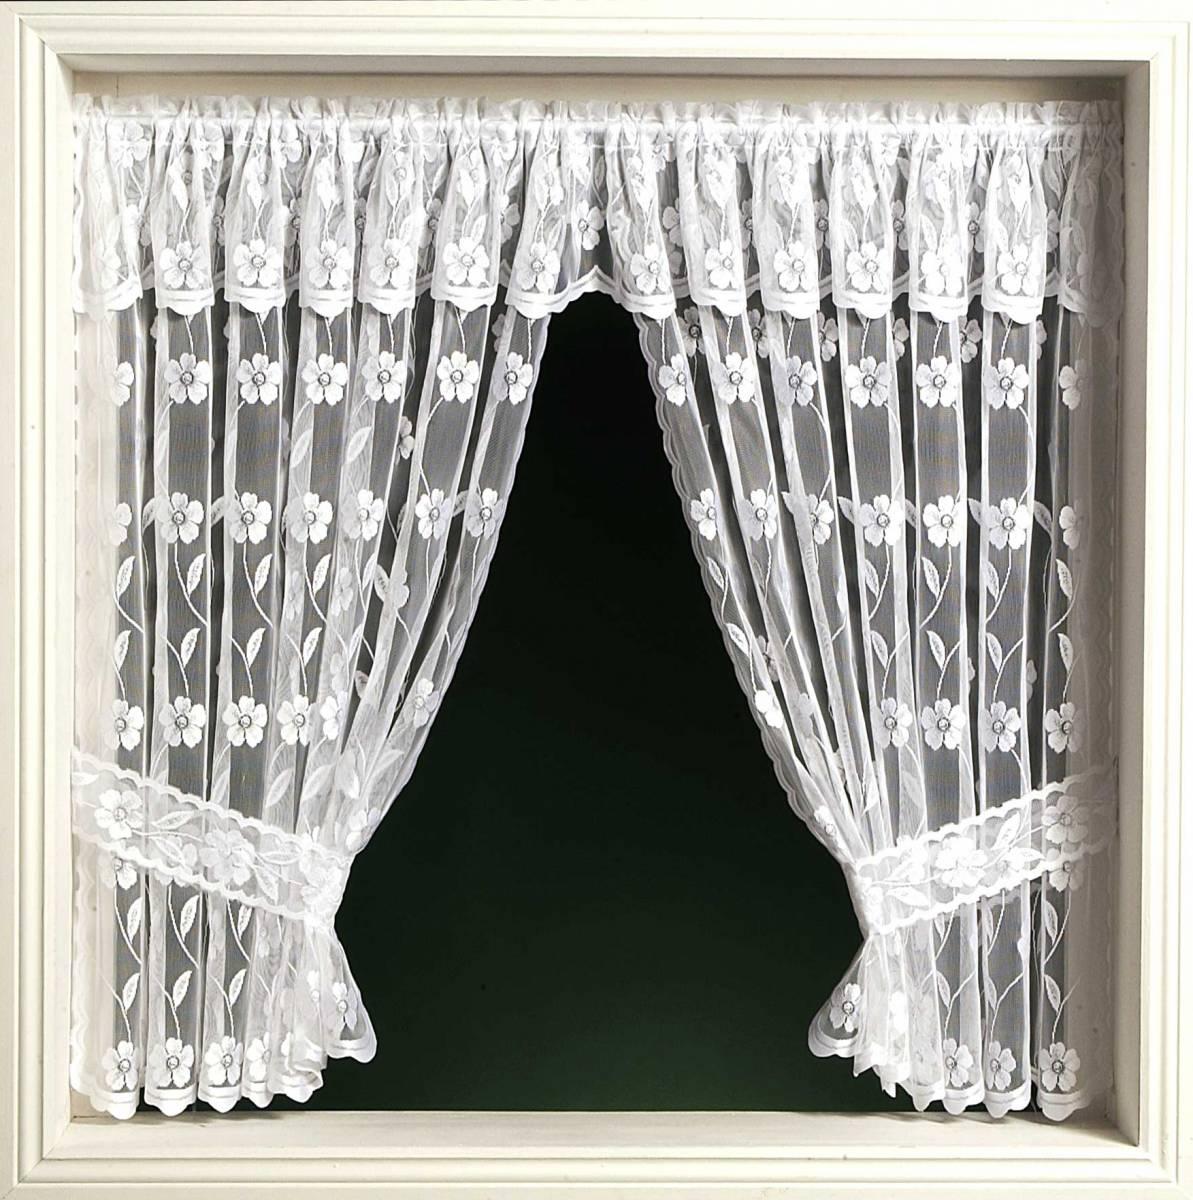 jalipur window set priced per curtain white or cream. Black Bedroom Furniture Sets. Home Design Ideas